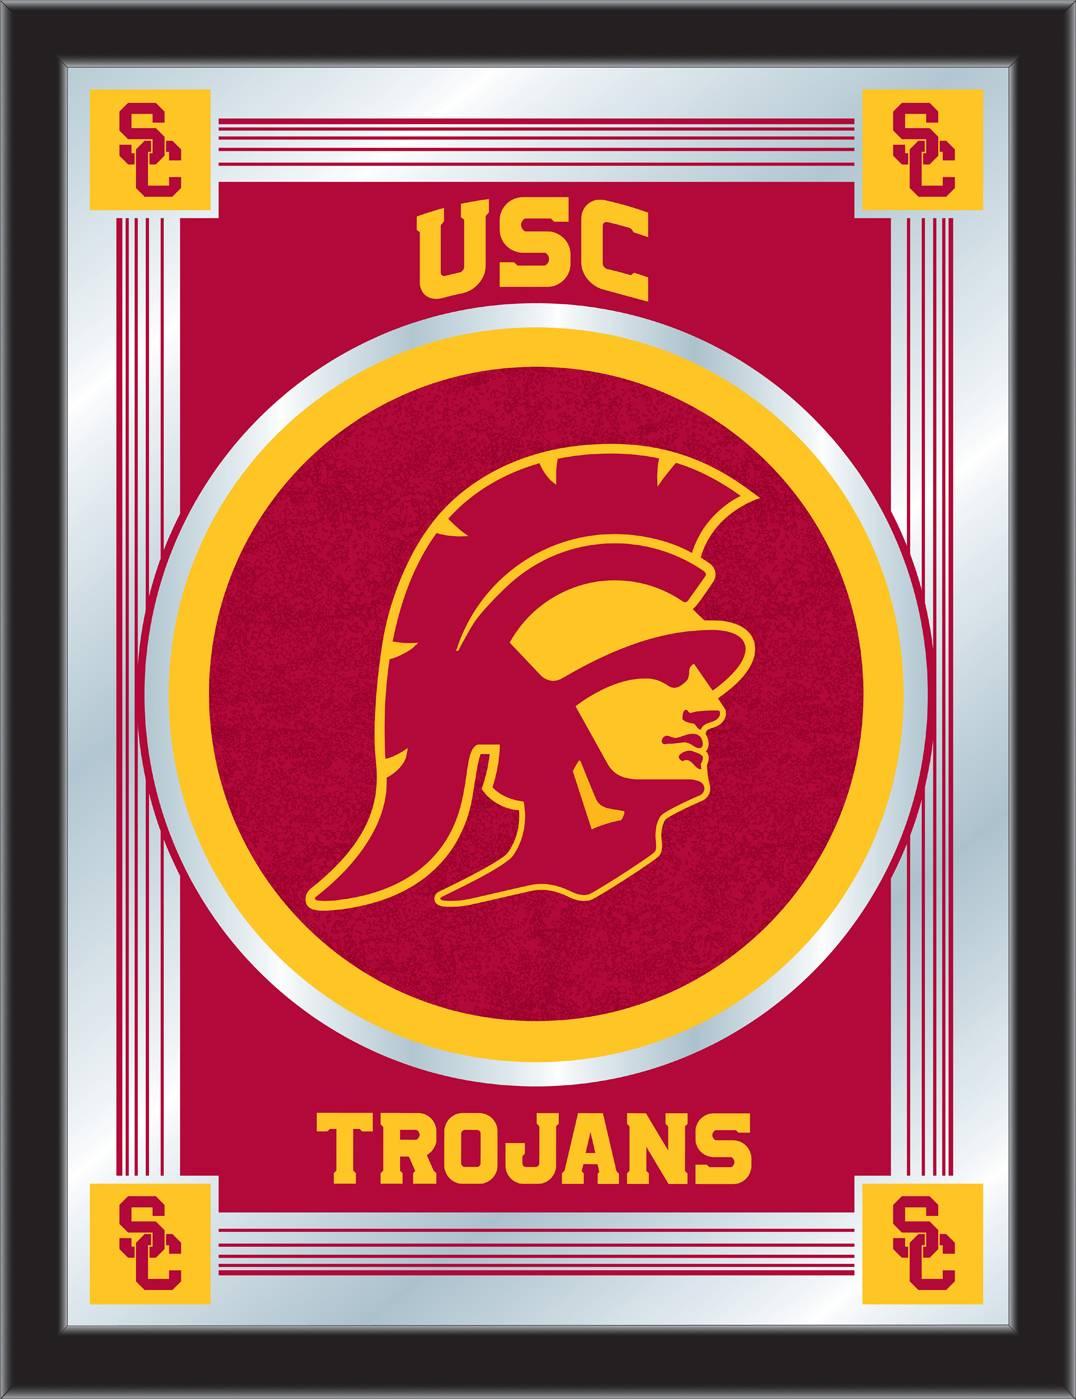 USC Trojans Logo Mirror : usc trojans logo mirrormainProductImageFullSize from www.sportsunlimitedinc.com size 921 x 1200 jpeg 215kB